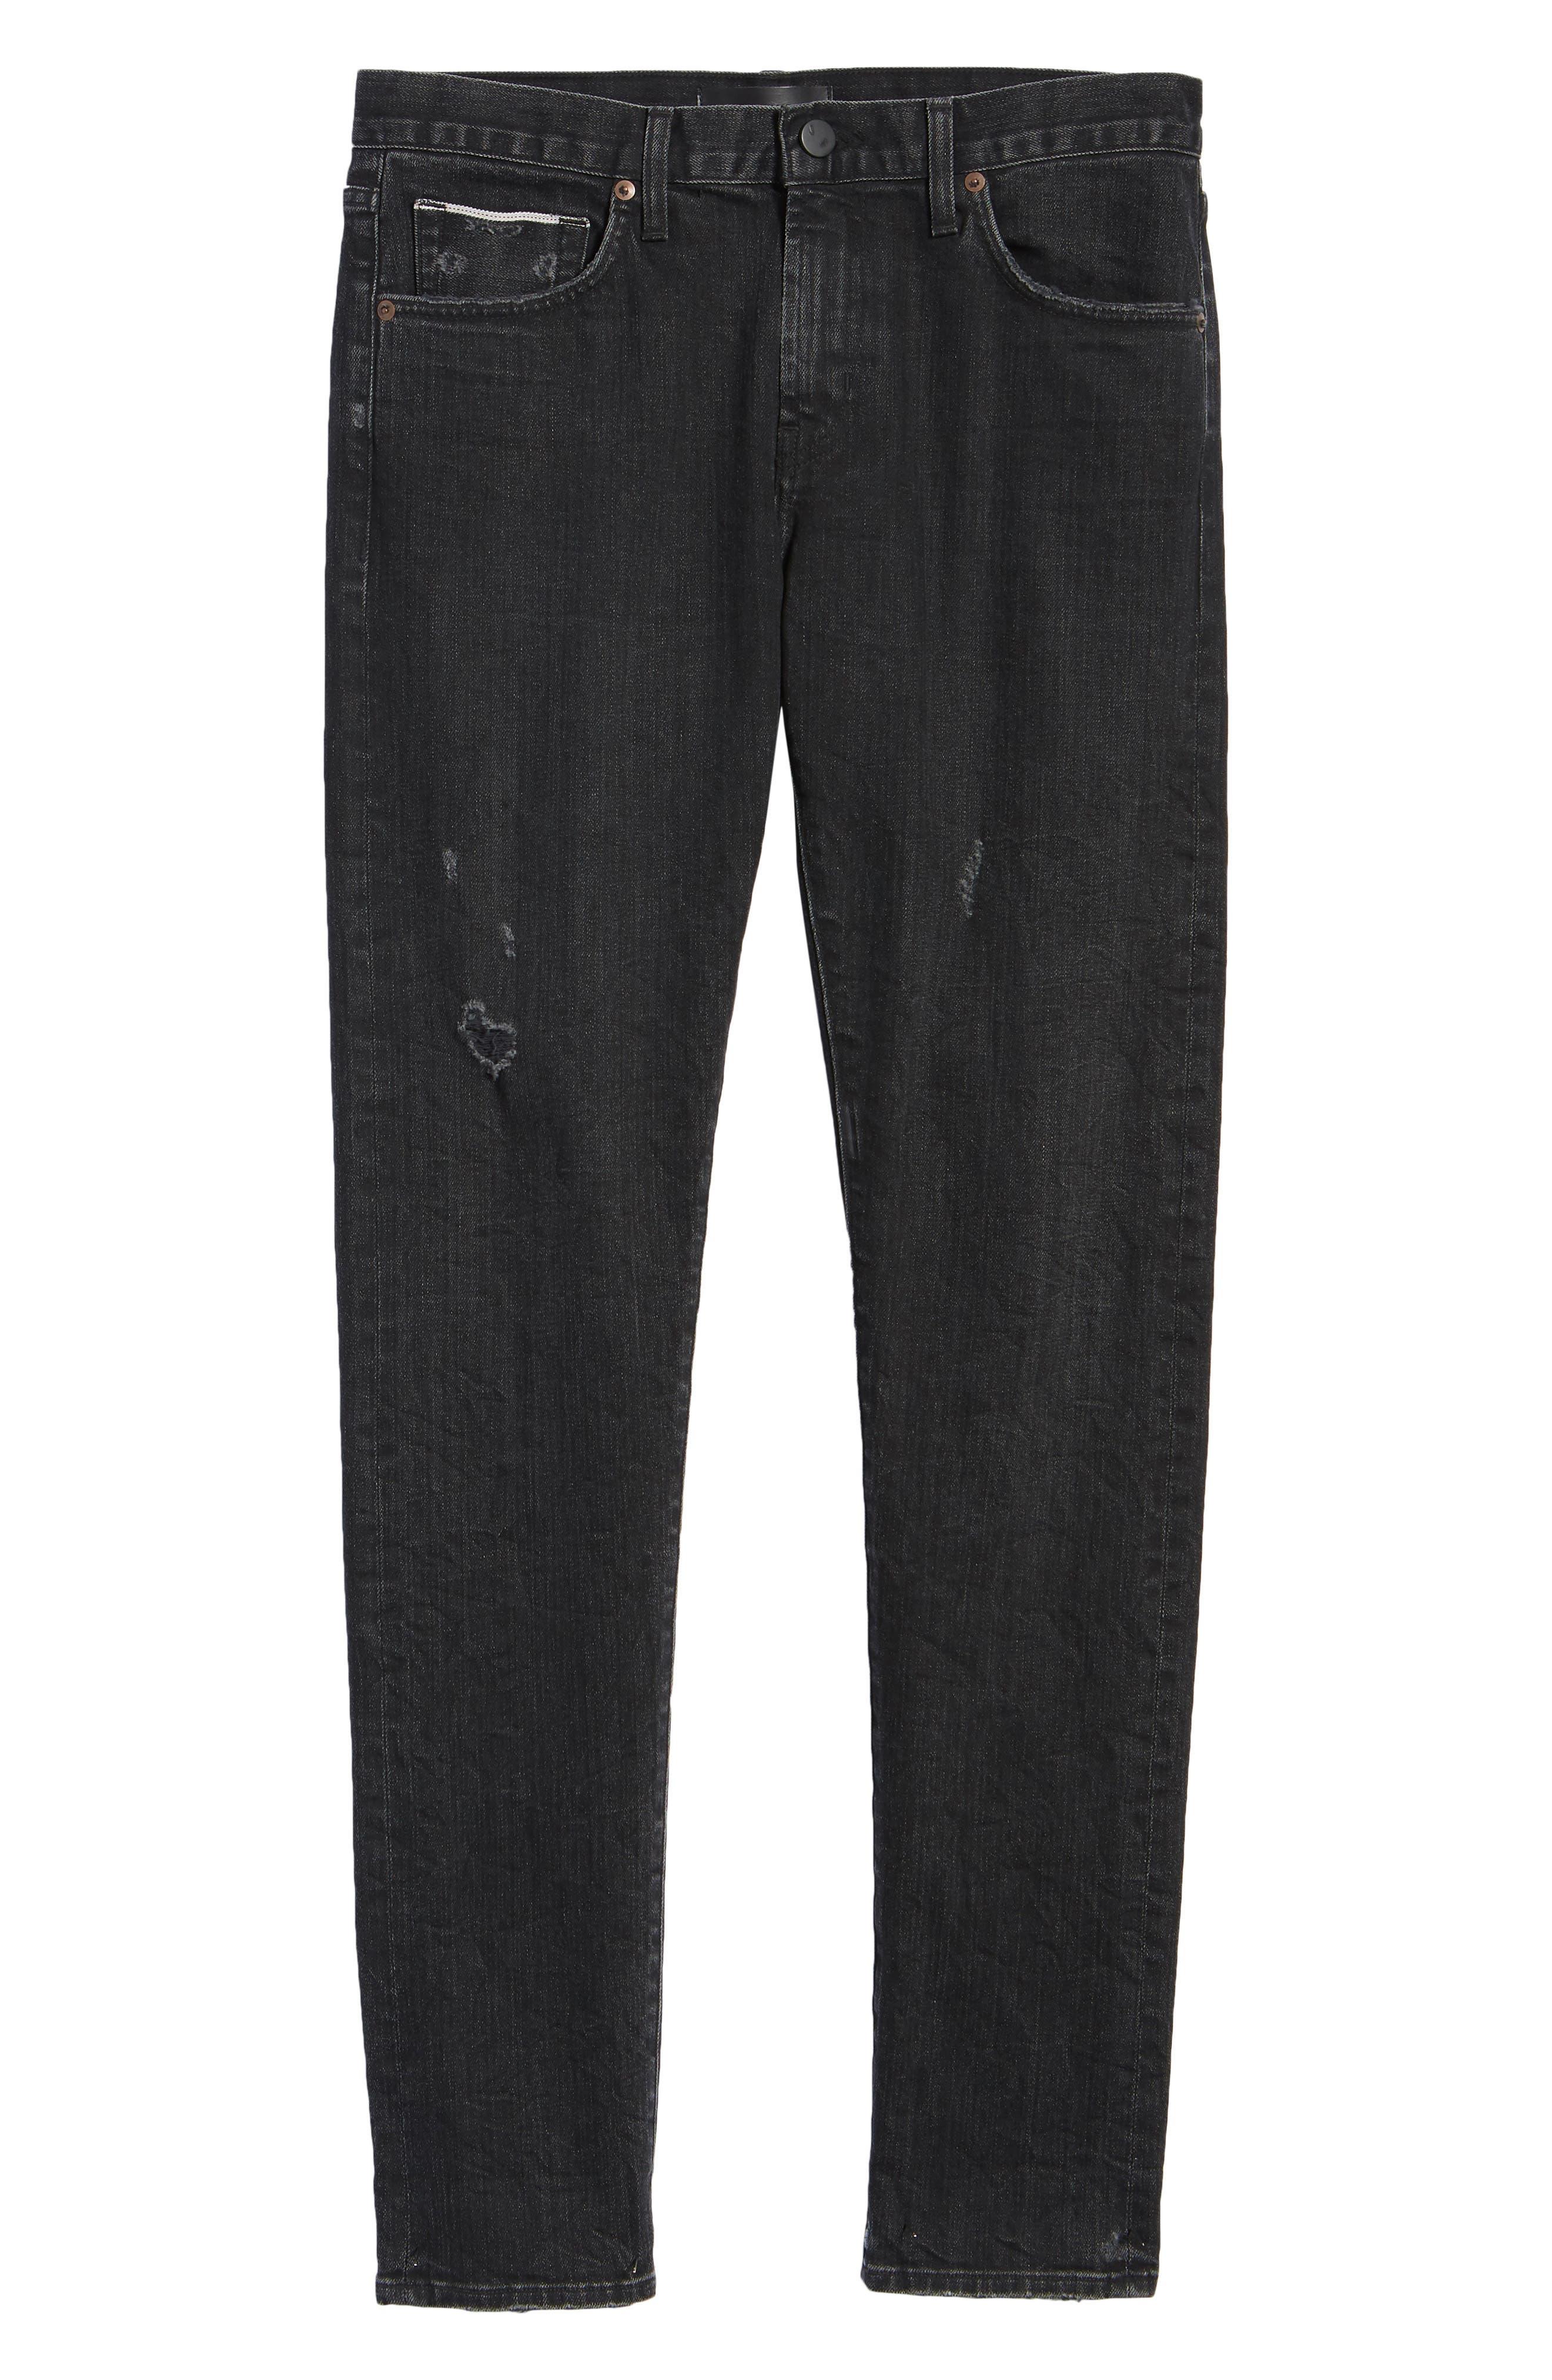 Tyler Slim Fit Jeans,                             Alternate thumbnail 6, color,                             009